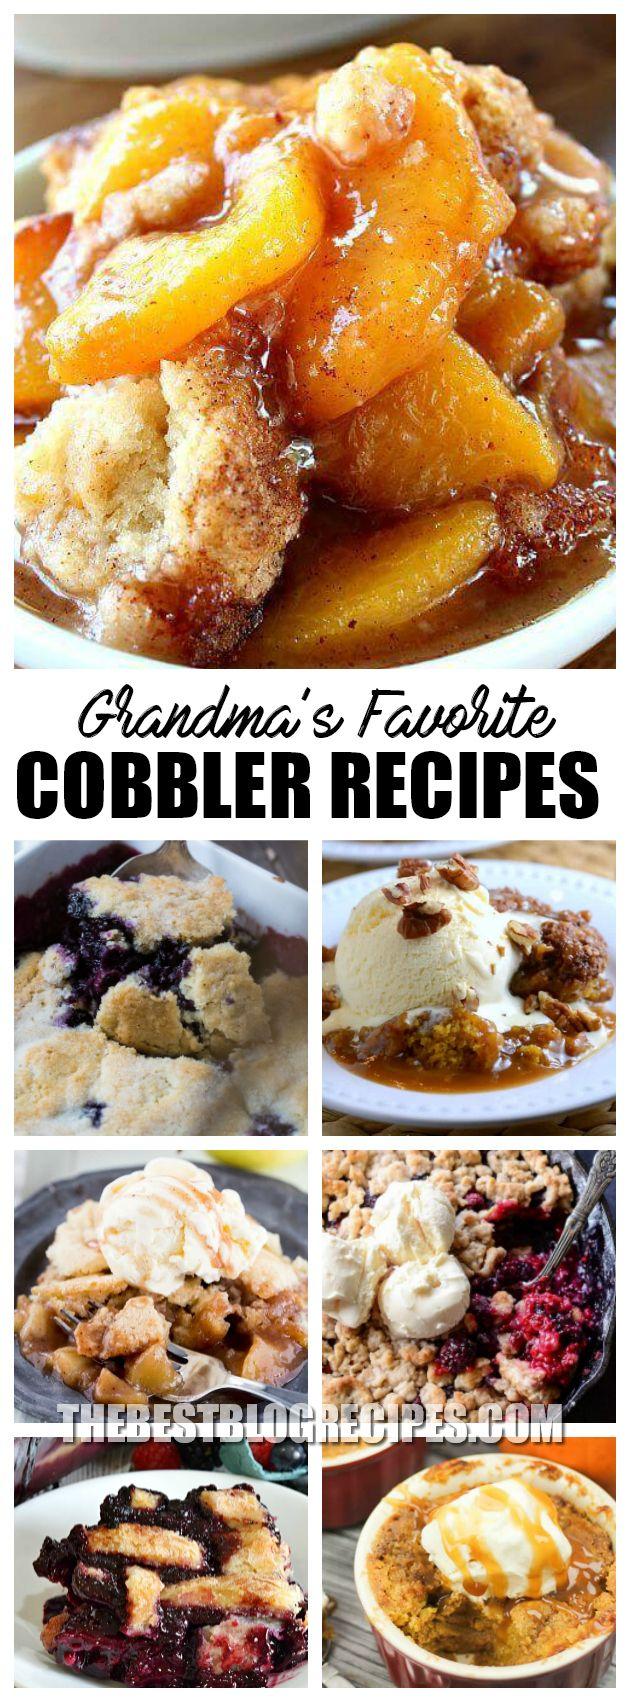 Best Fruit Cobbler Recipes | The Best Blog Recipes